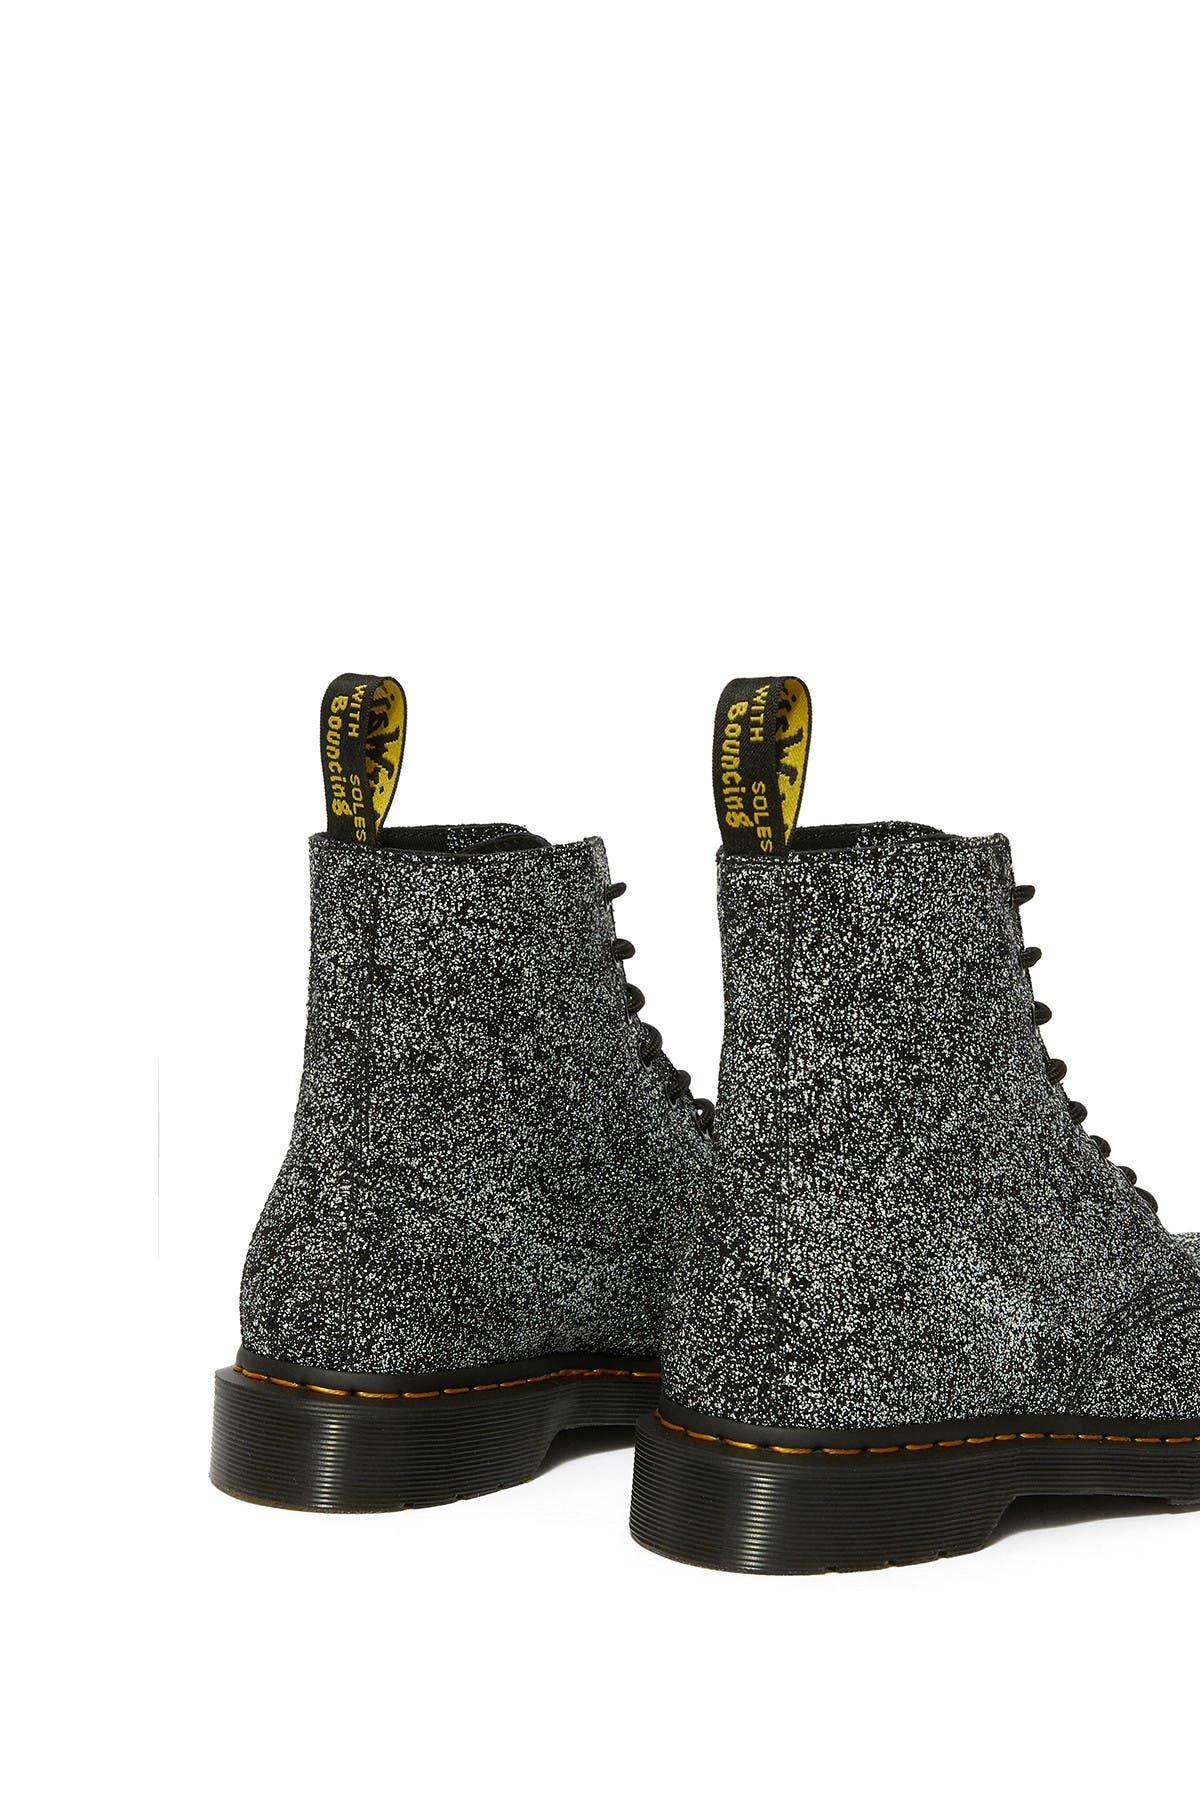 Dr. Martens 1460 Pascal Boot In Black Splatter